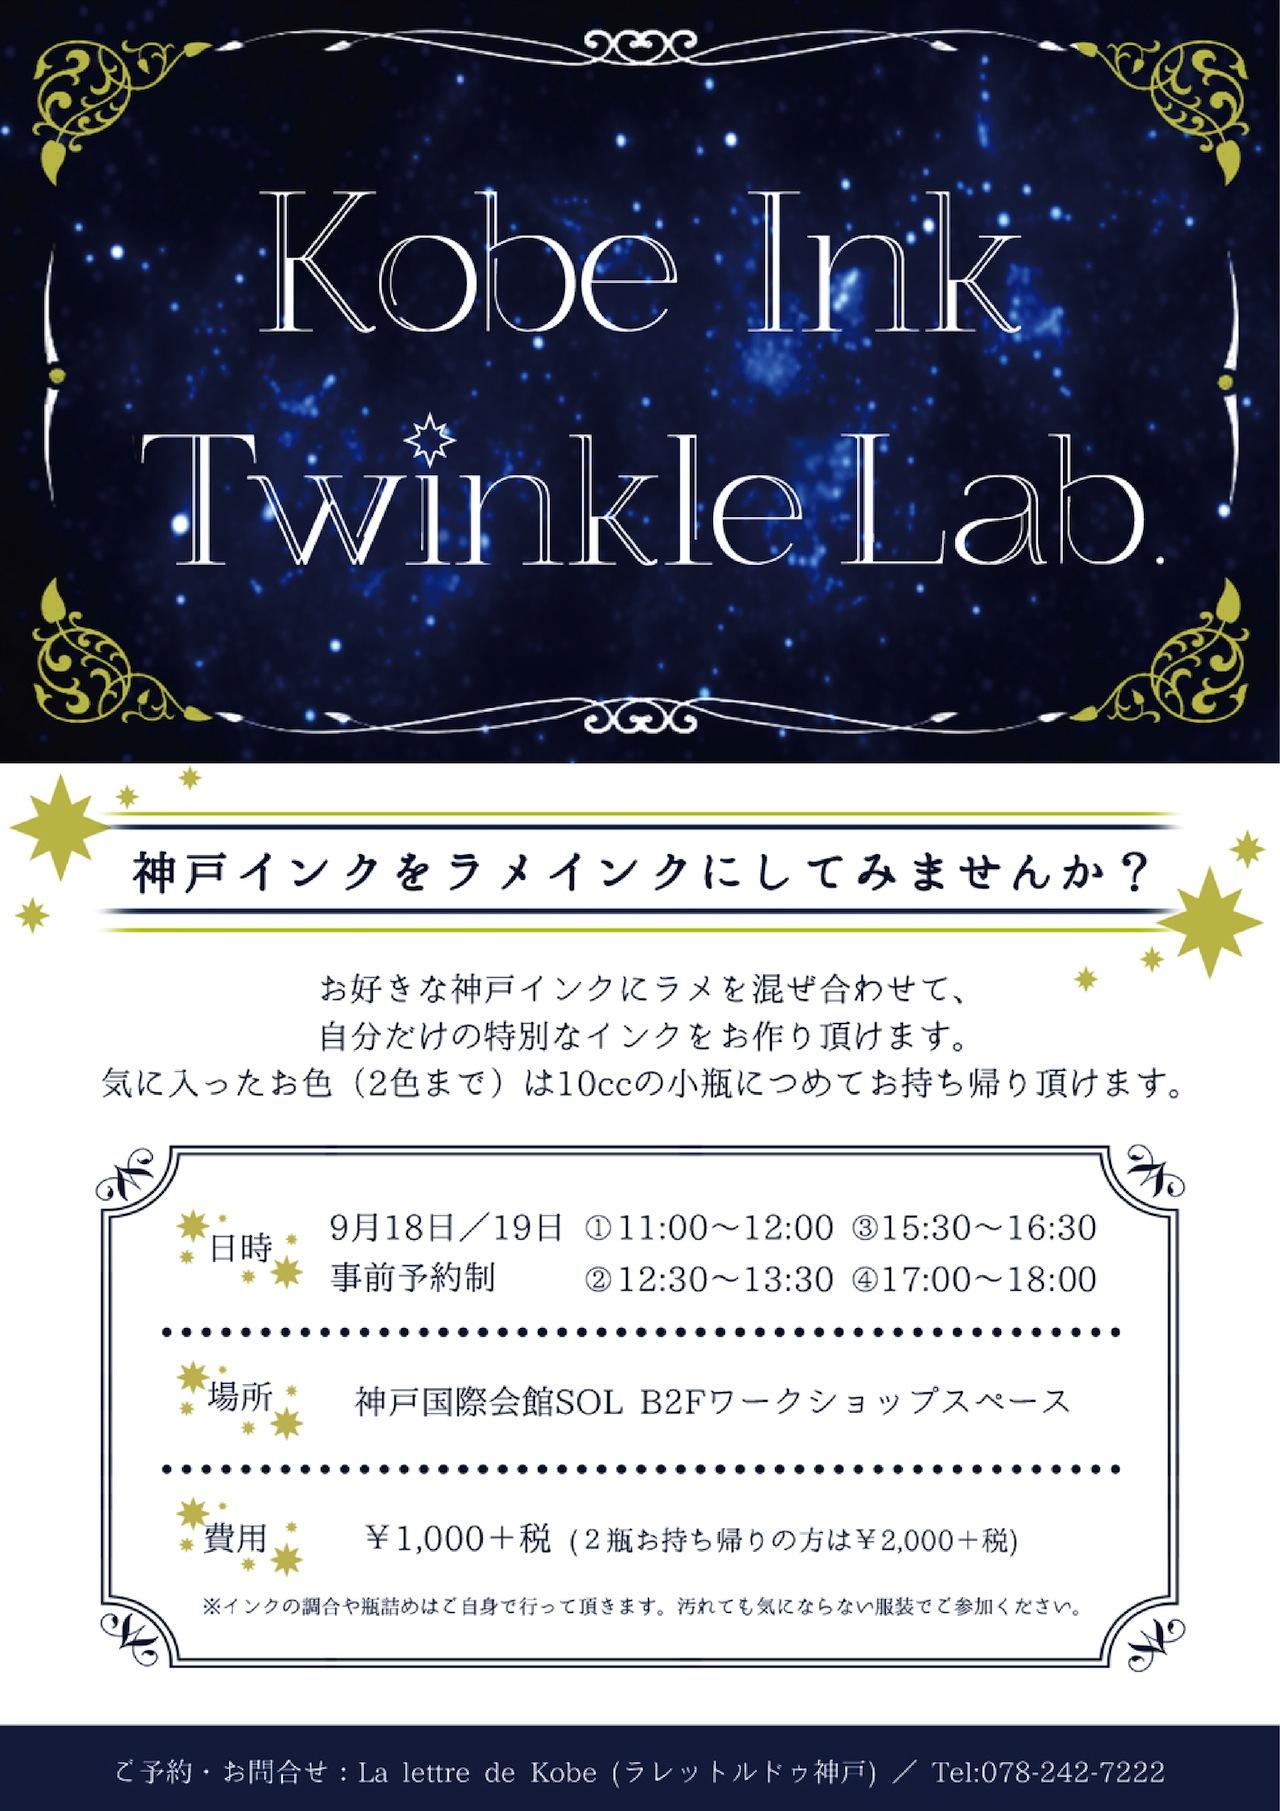 「KobeINK物語」をラメインクにしませんか? @神戸国際会館SOL B2F ワークショップスペース